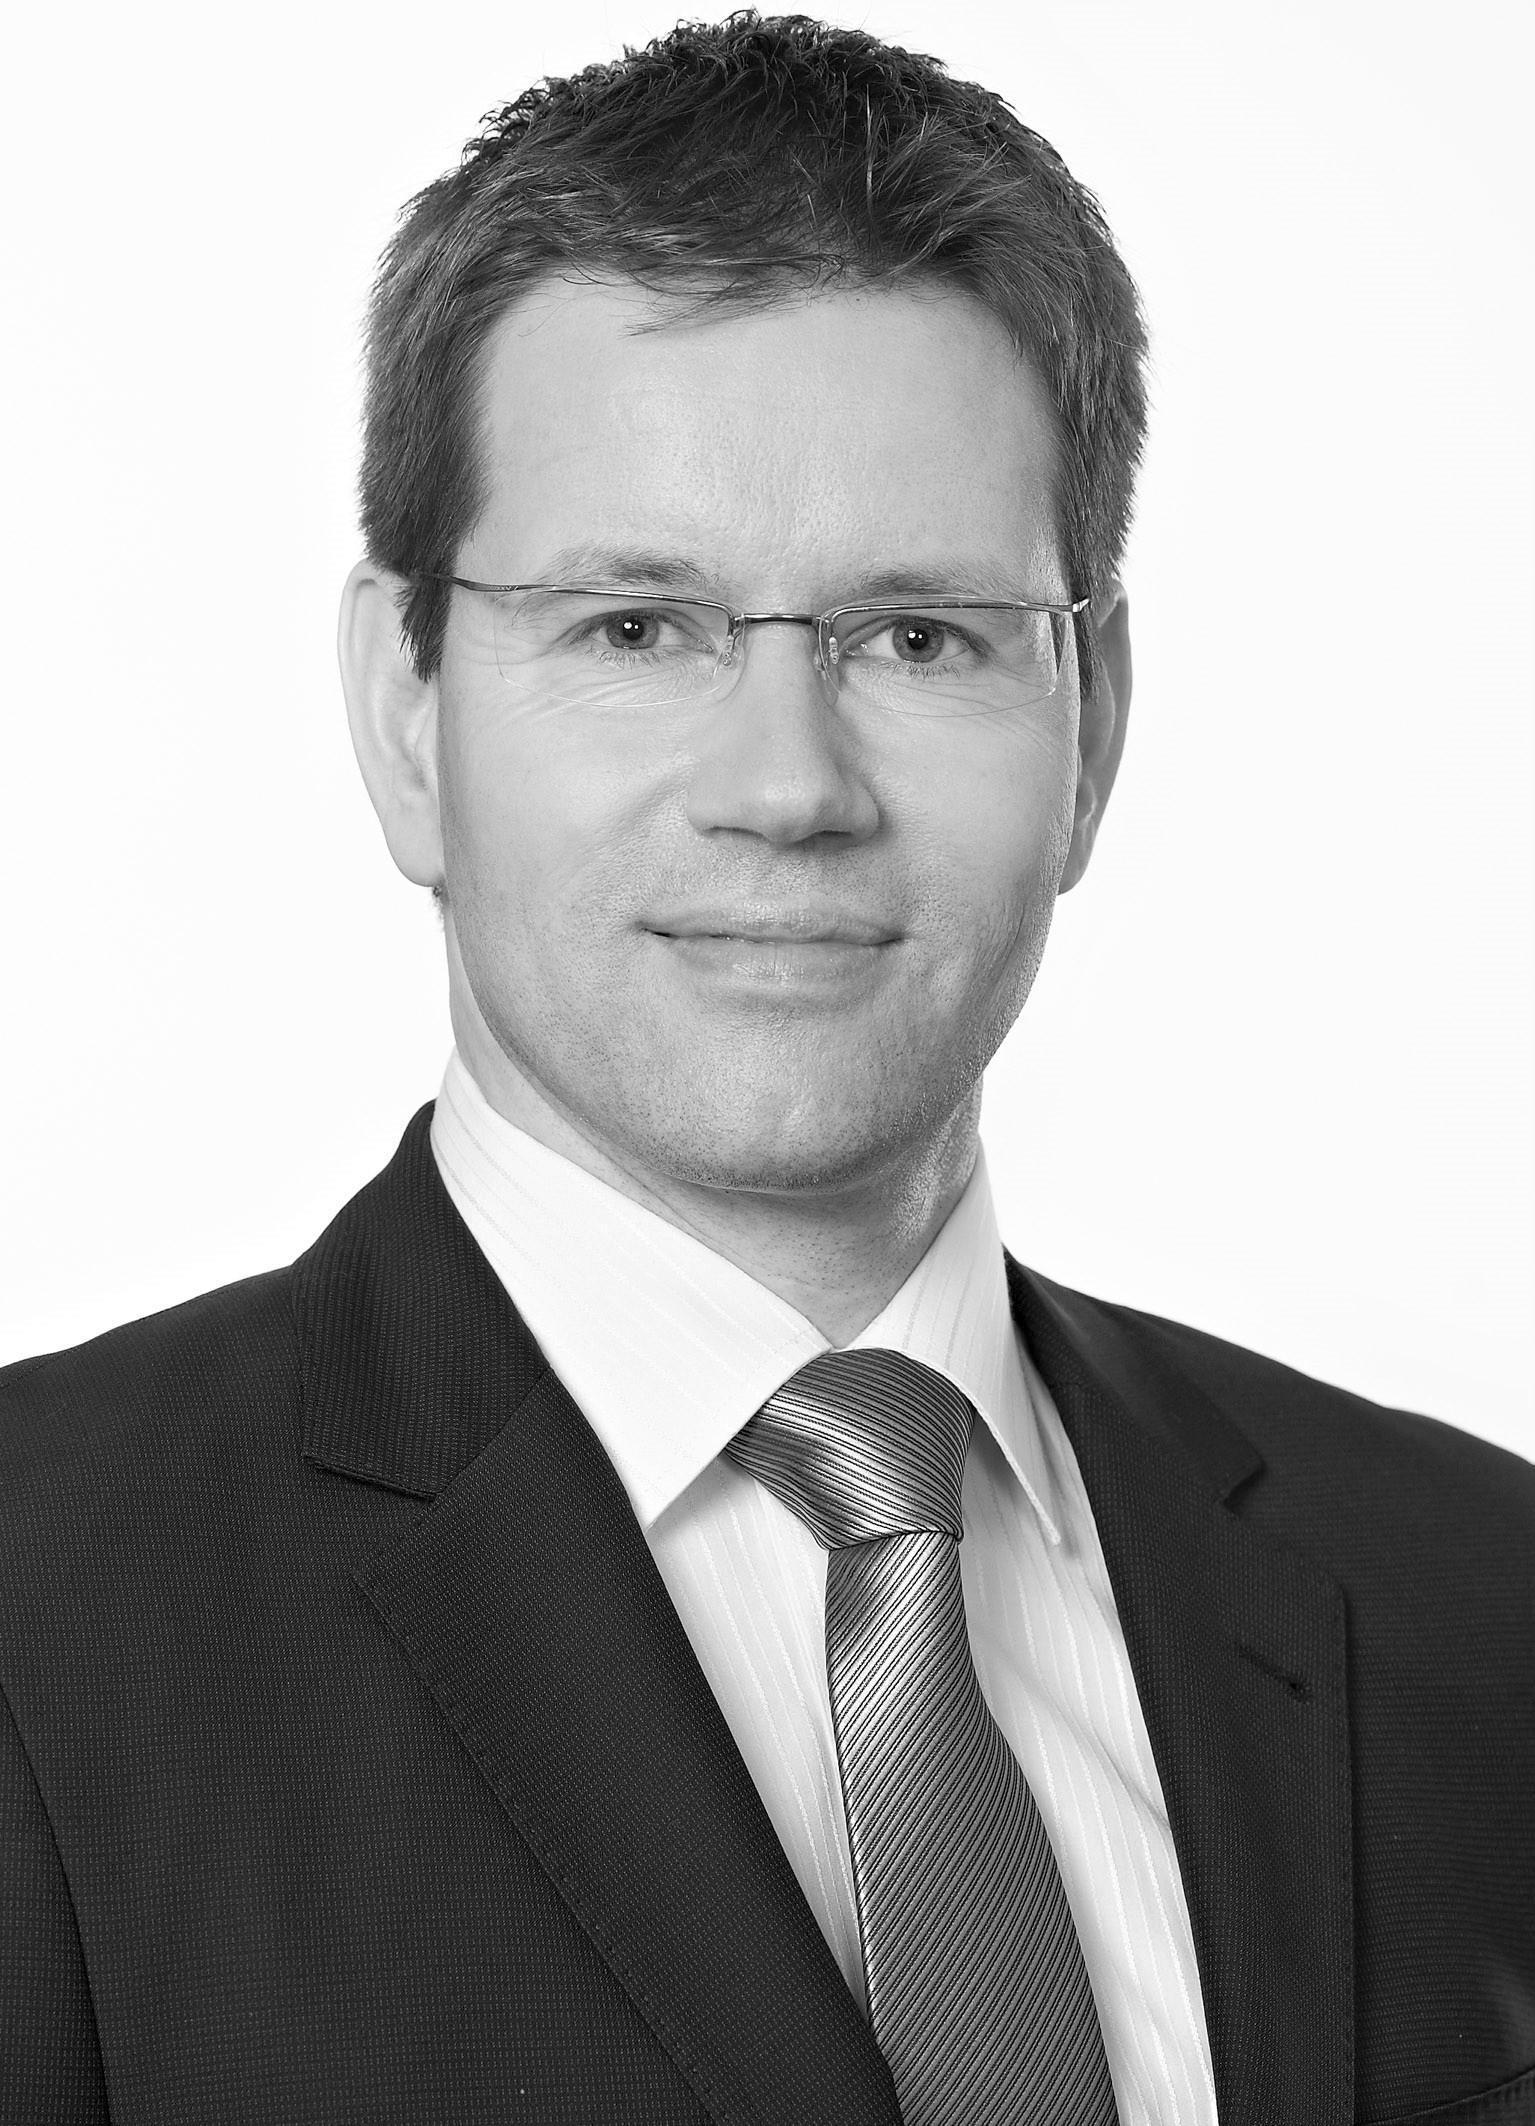 Jochen Meyer-Burow